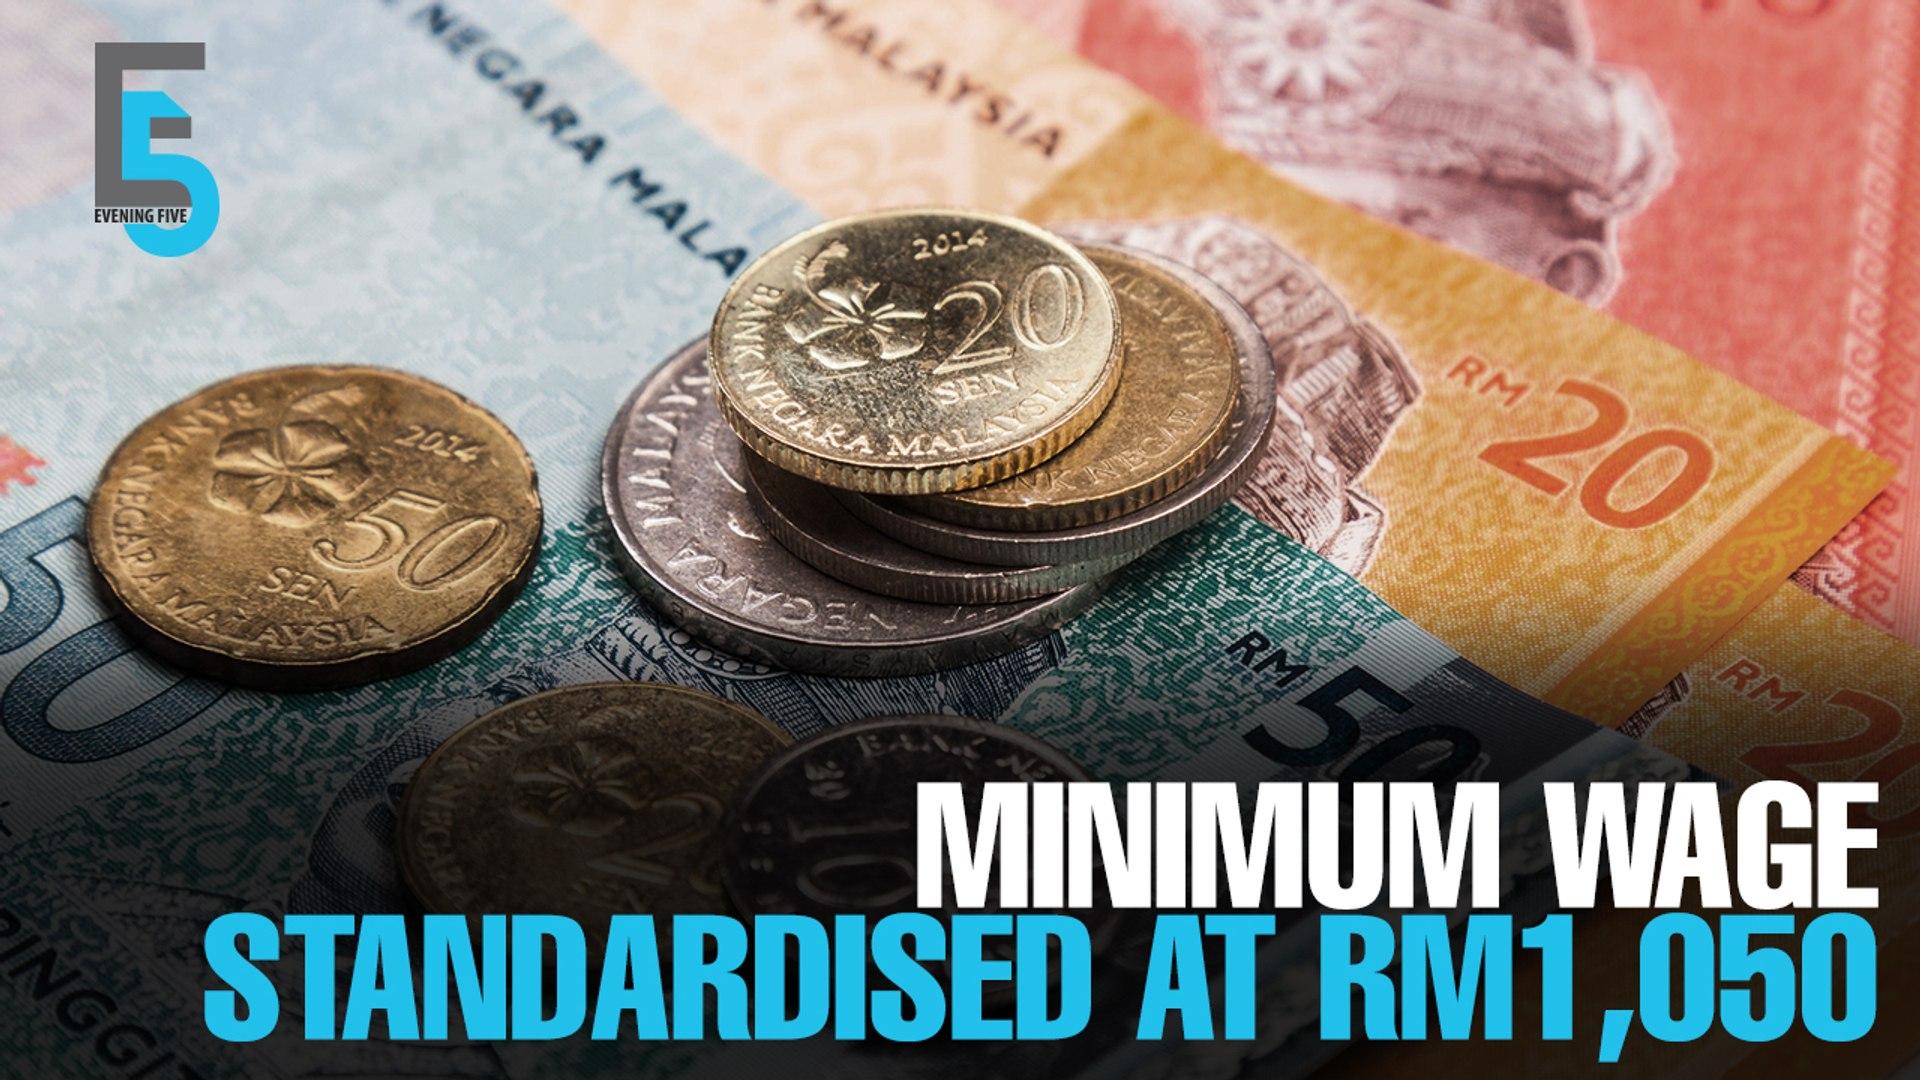 EVENING 5: Standardised minimum wage in 2019